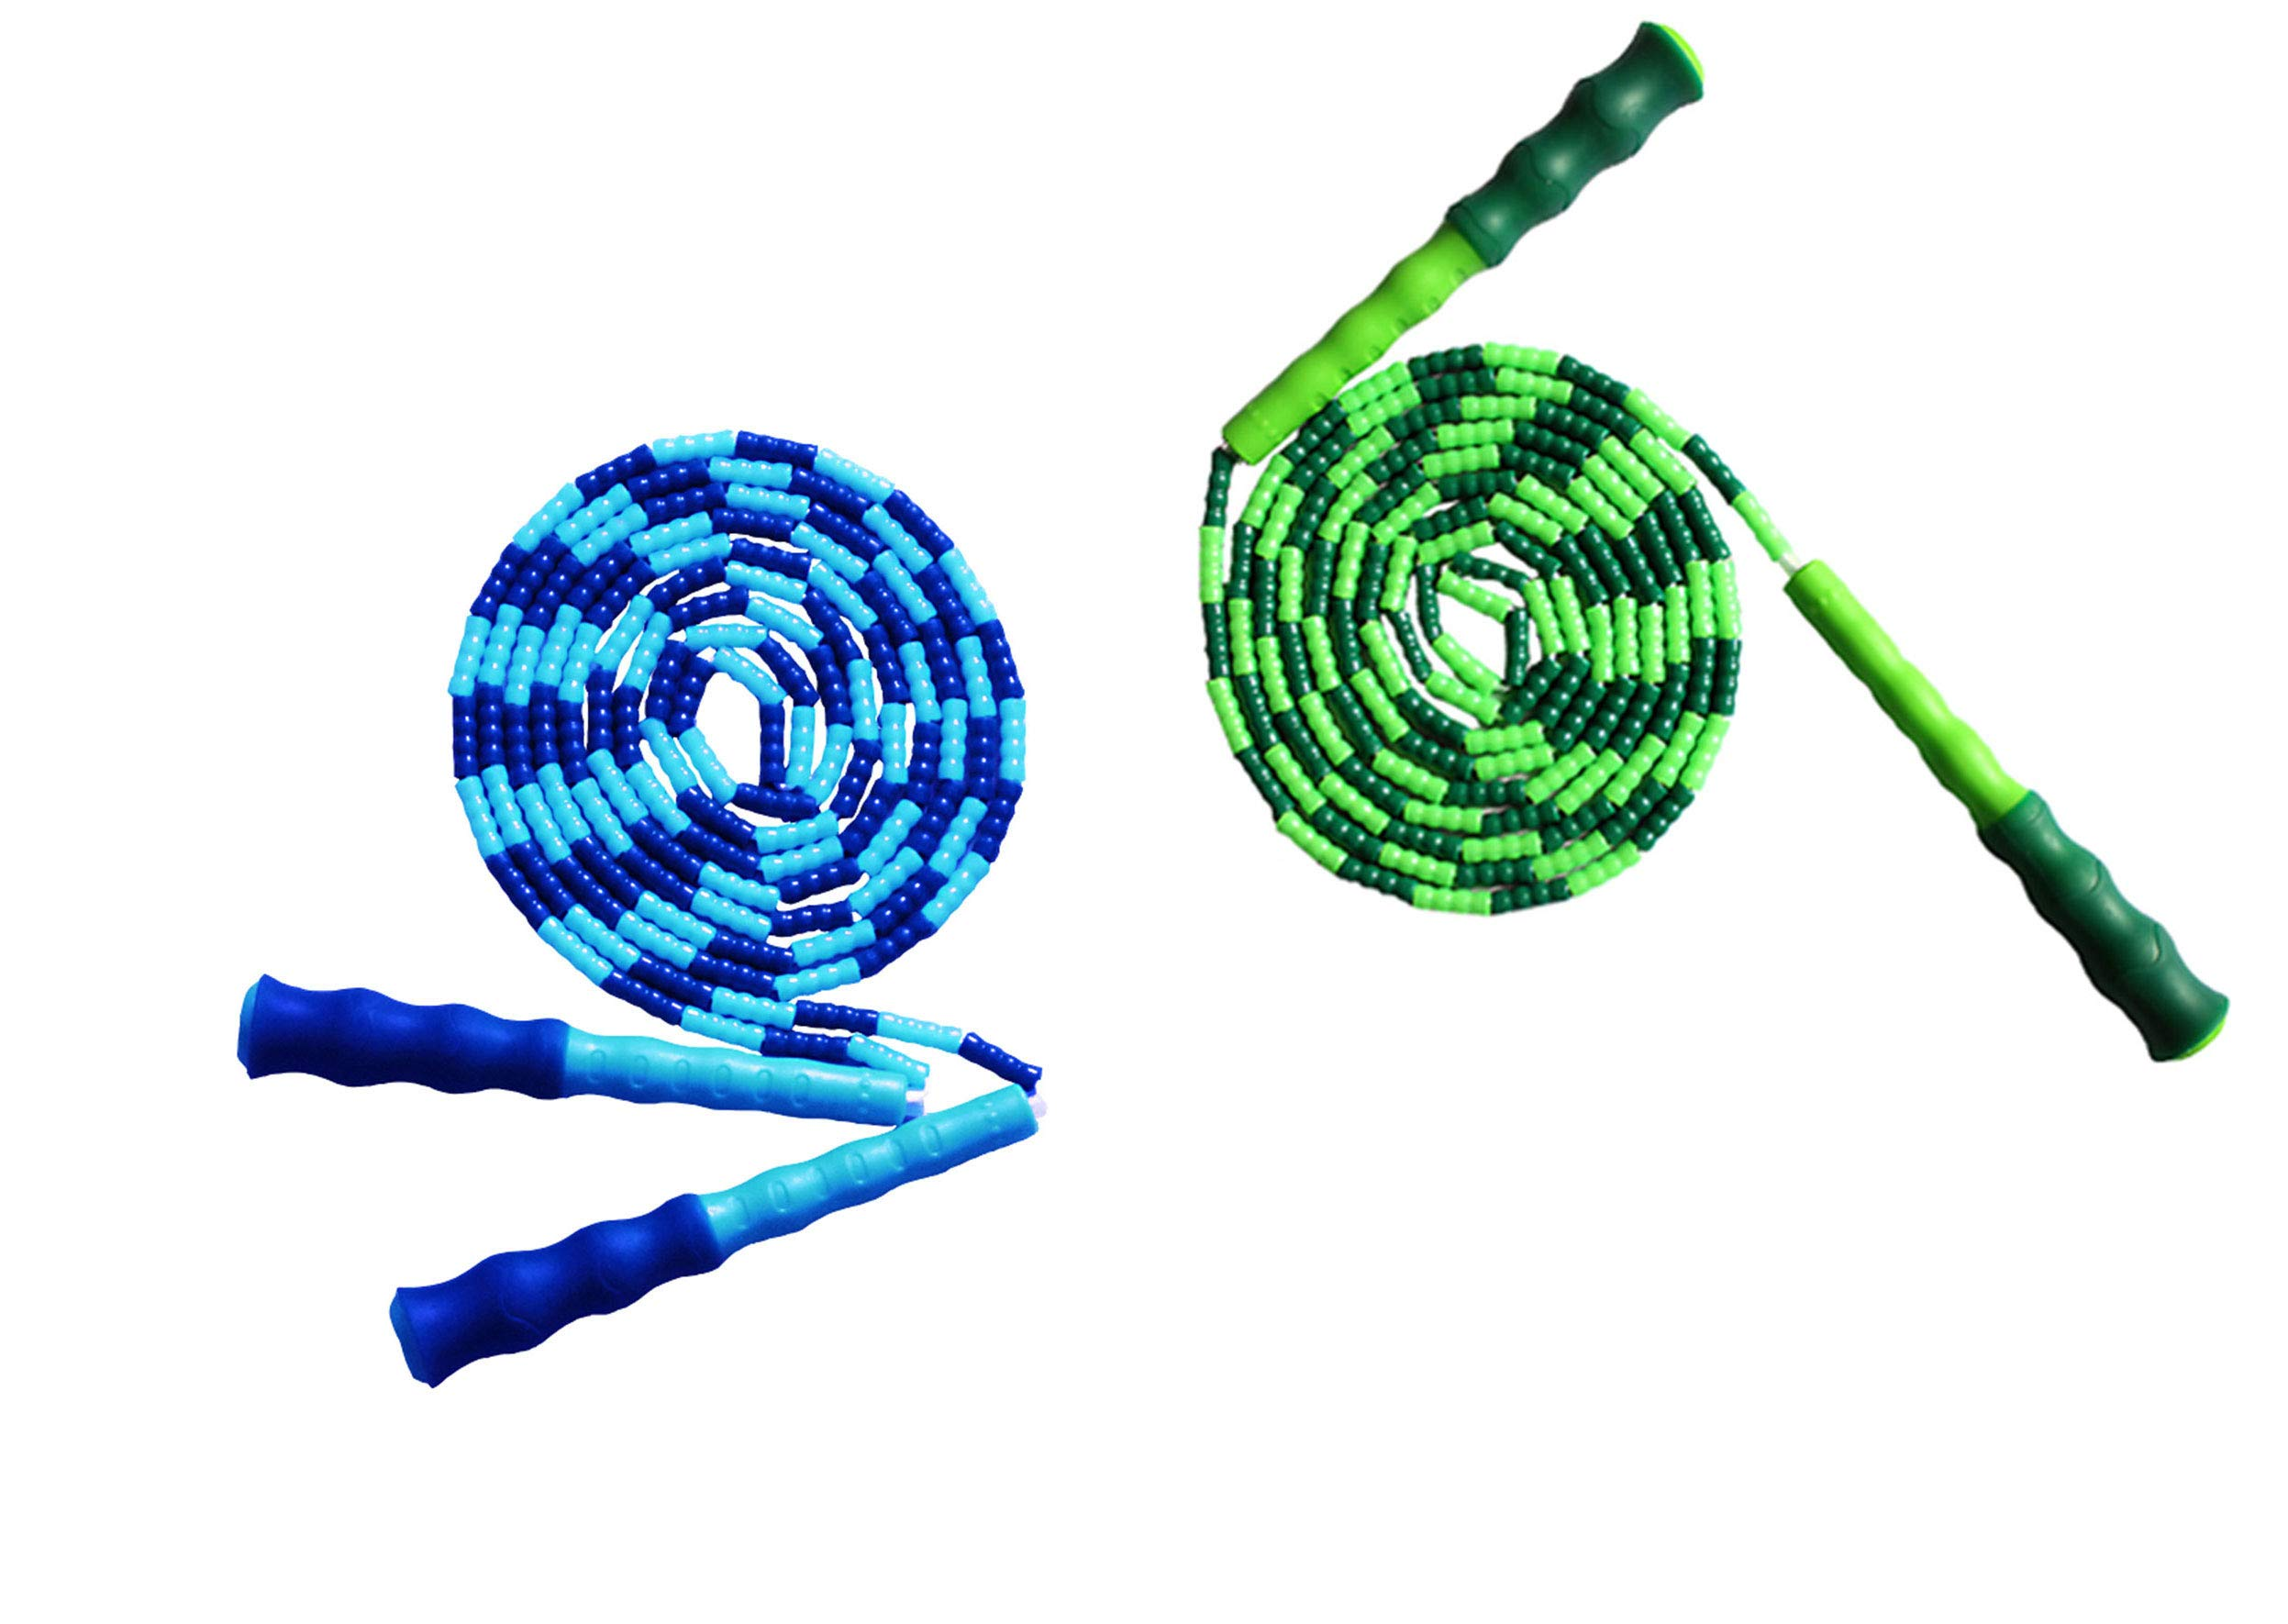 LETUSPORT 9 Feet Adjustable Beaded Segmented Jump Rope for Women Men Kids Lightweight Work Out Speeding Jumping Ropes (Blue+Green, 2 pcs)